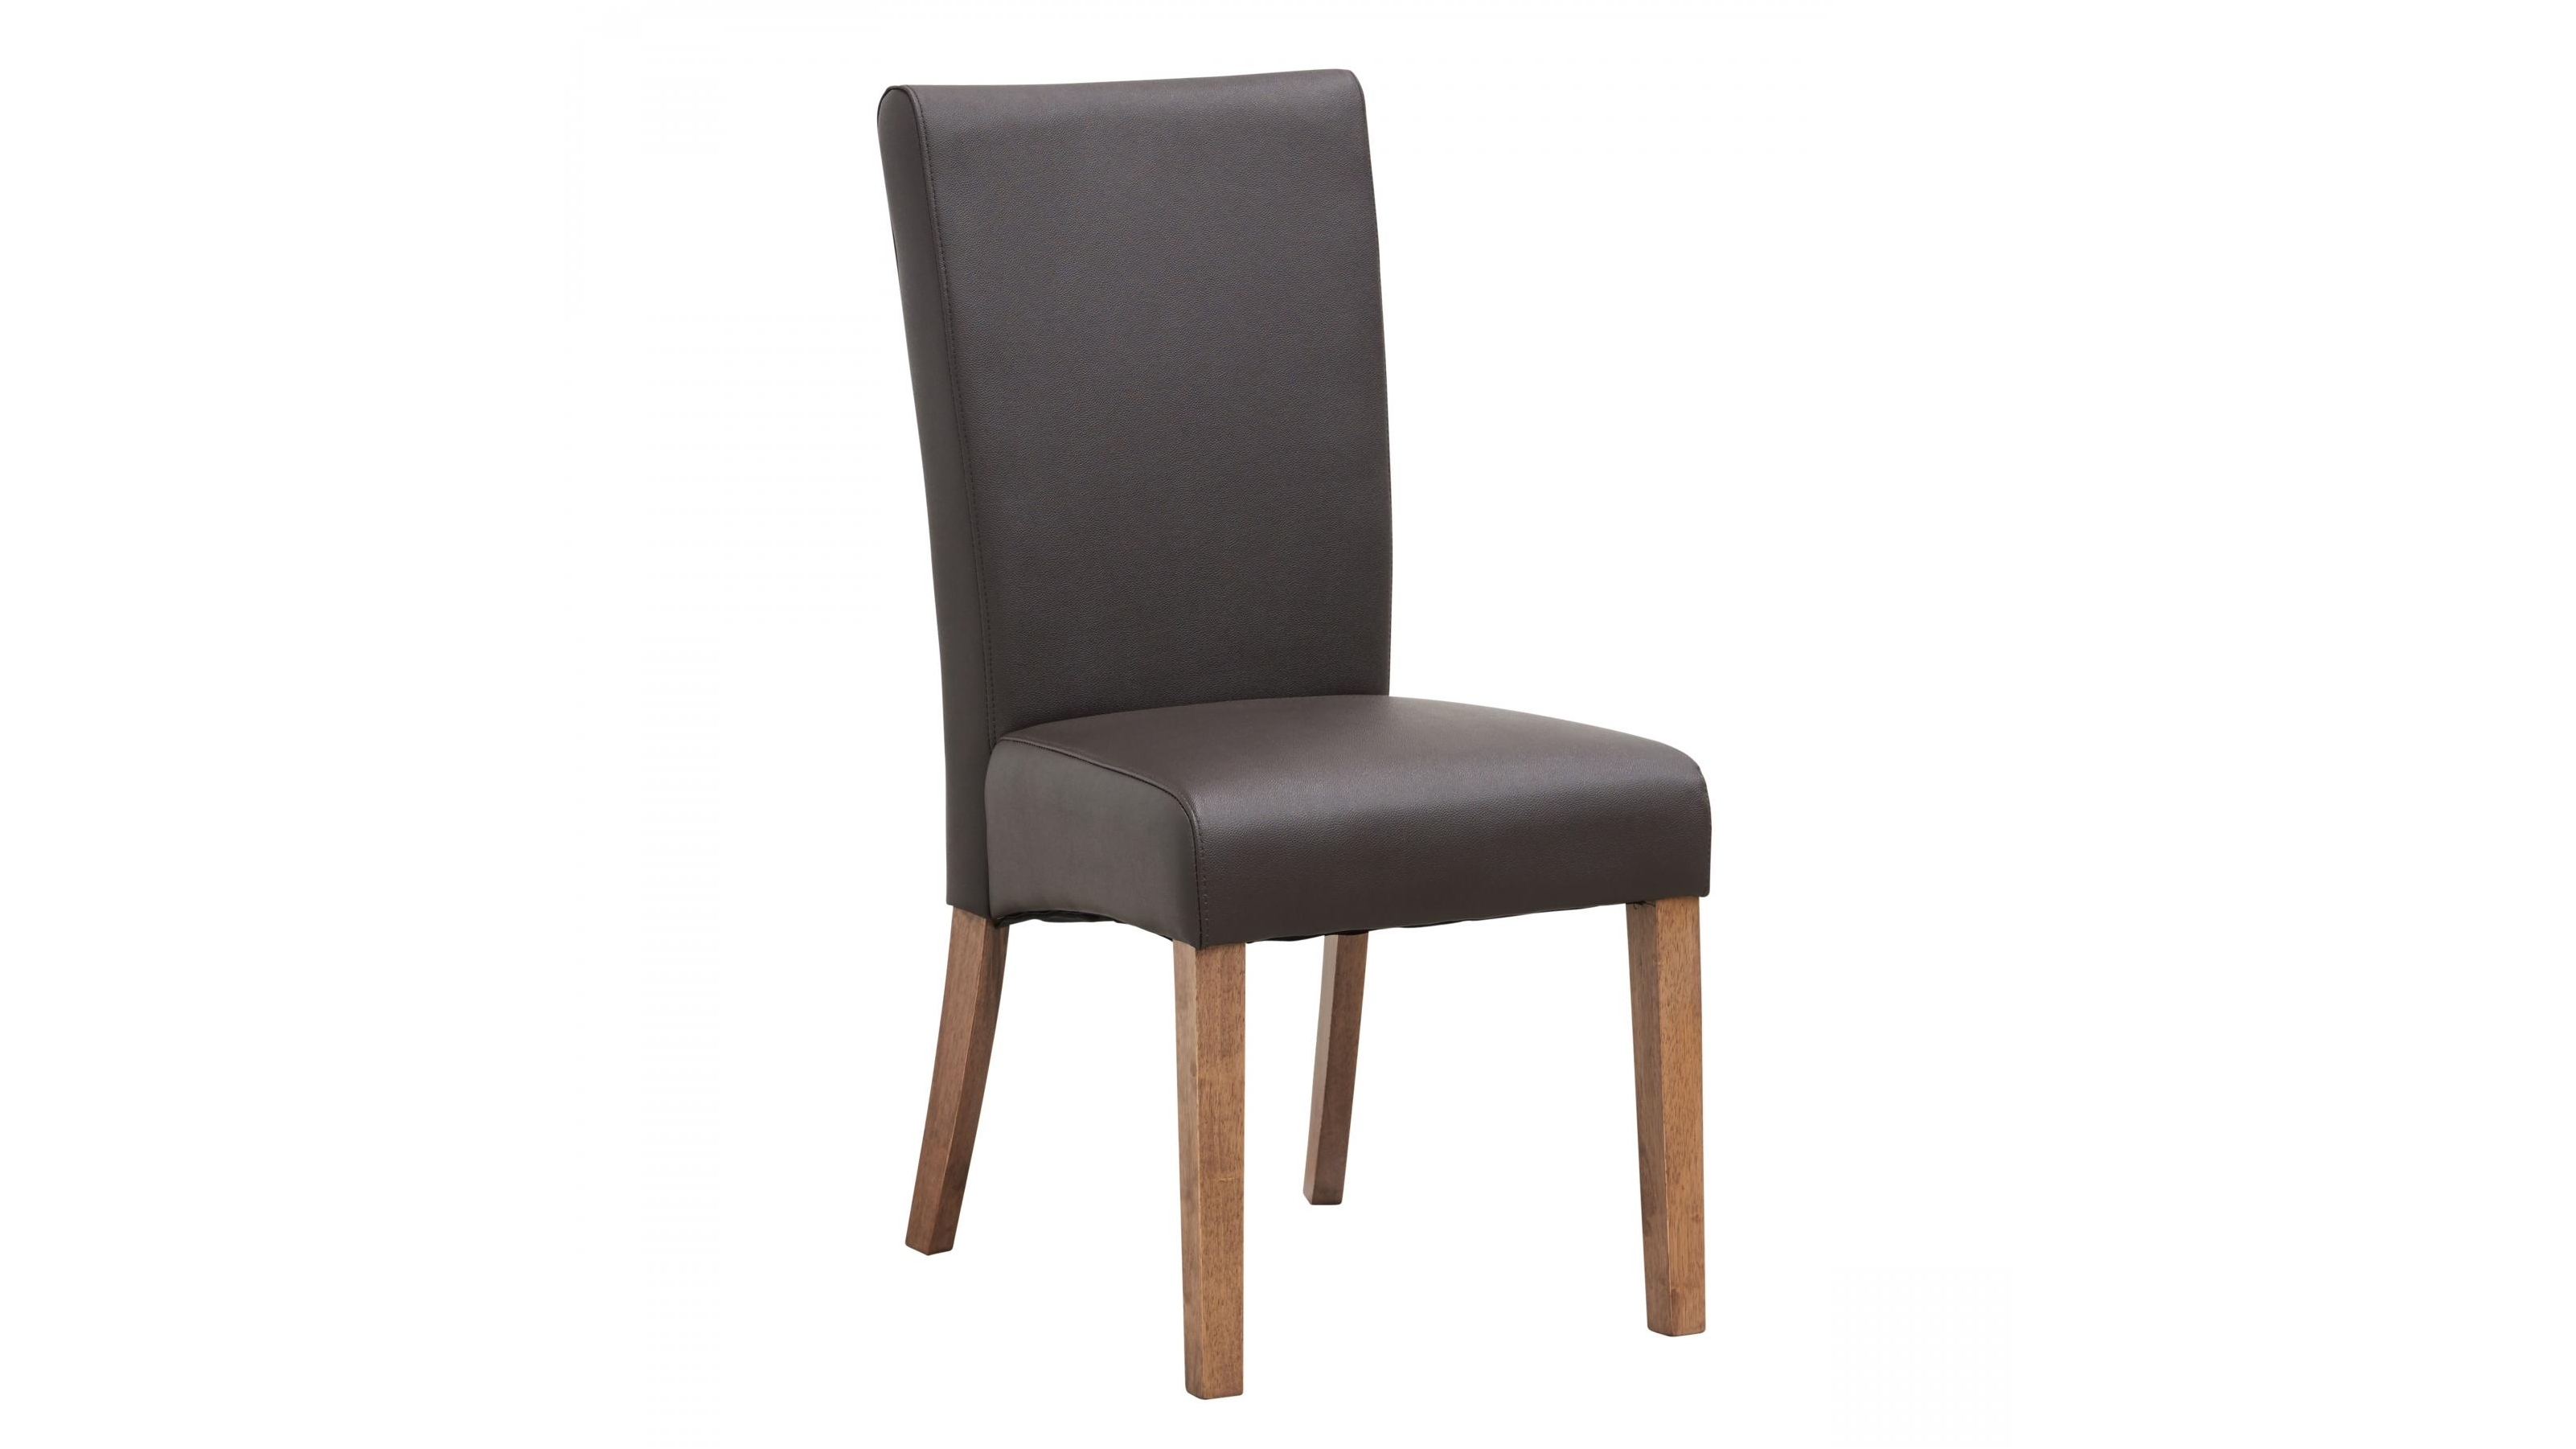 Buy Ashford Dining Chair  Harvey Norman AU